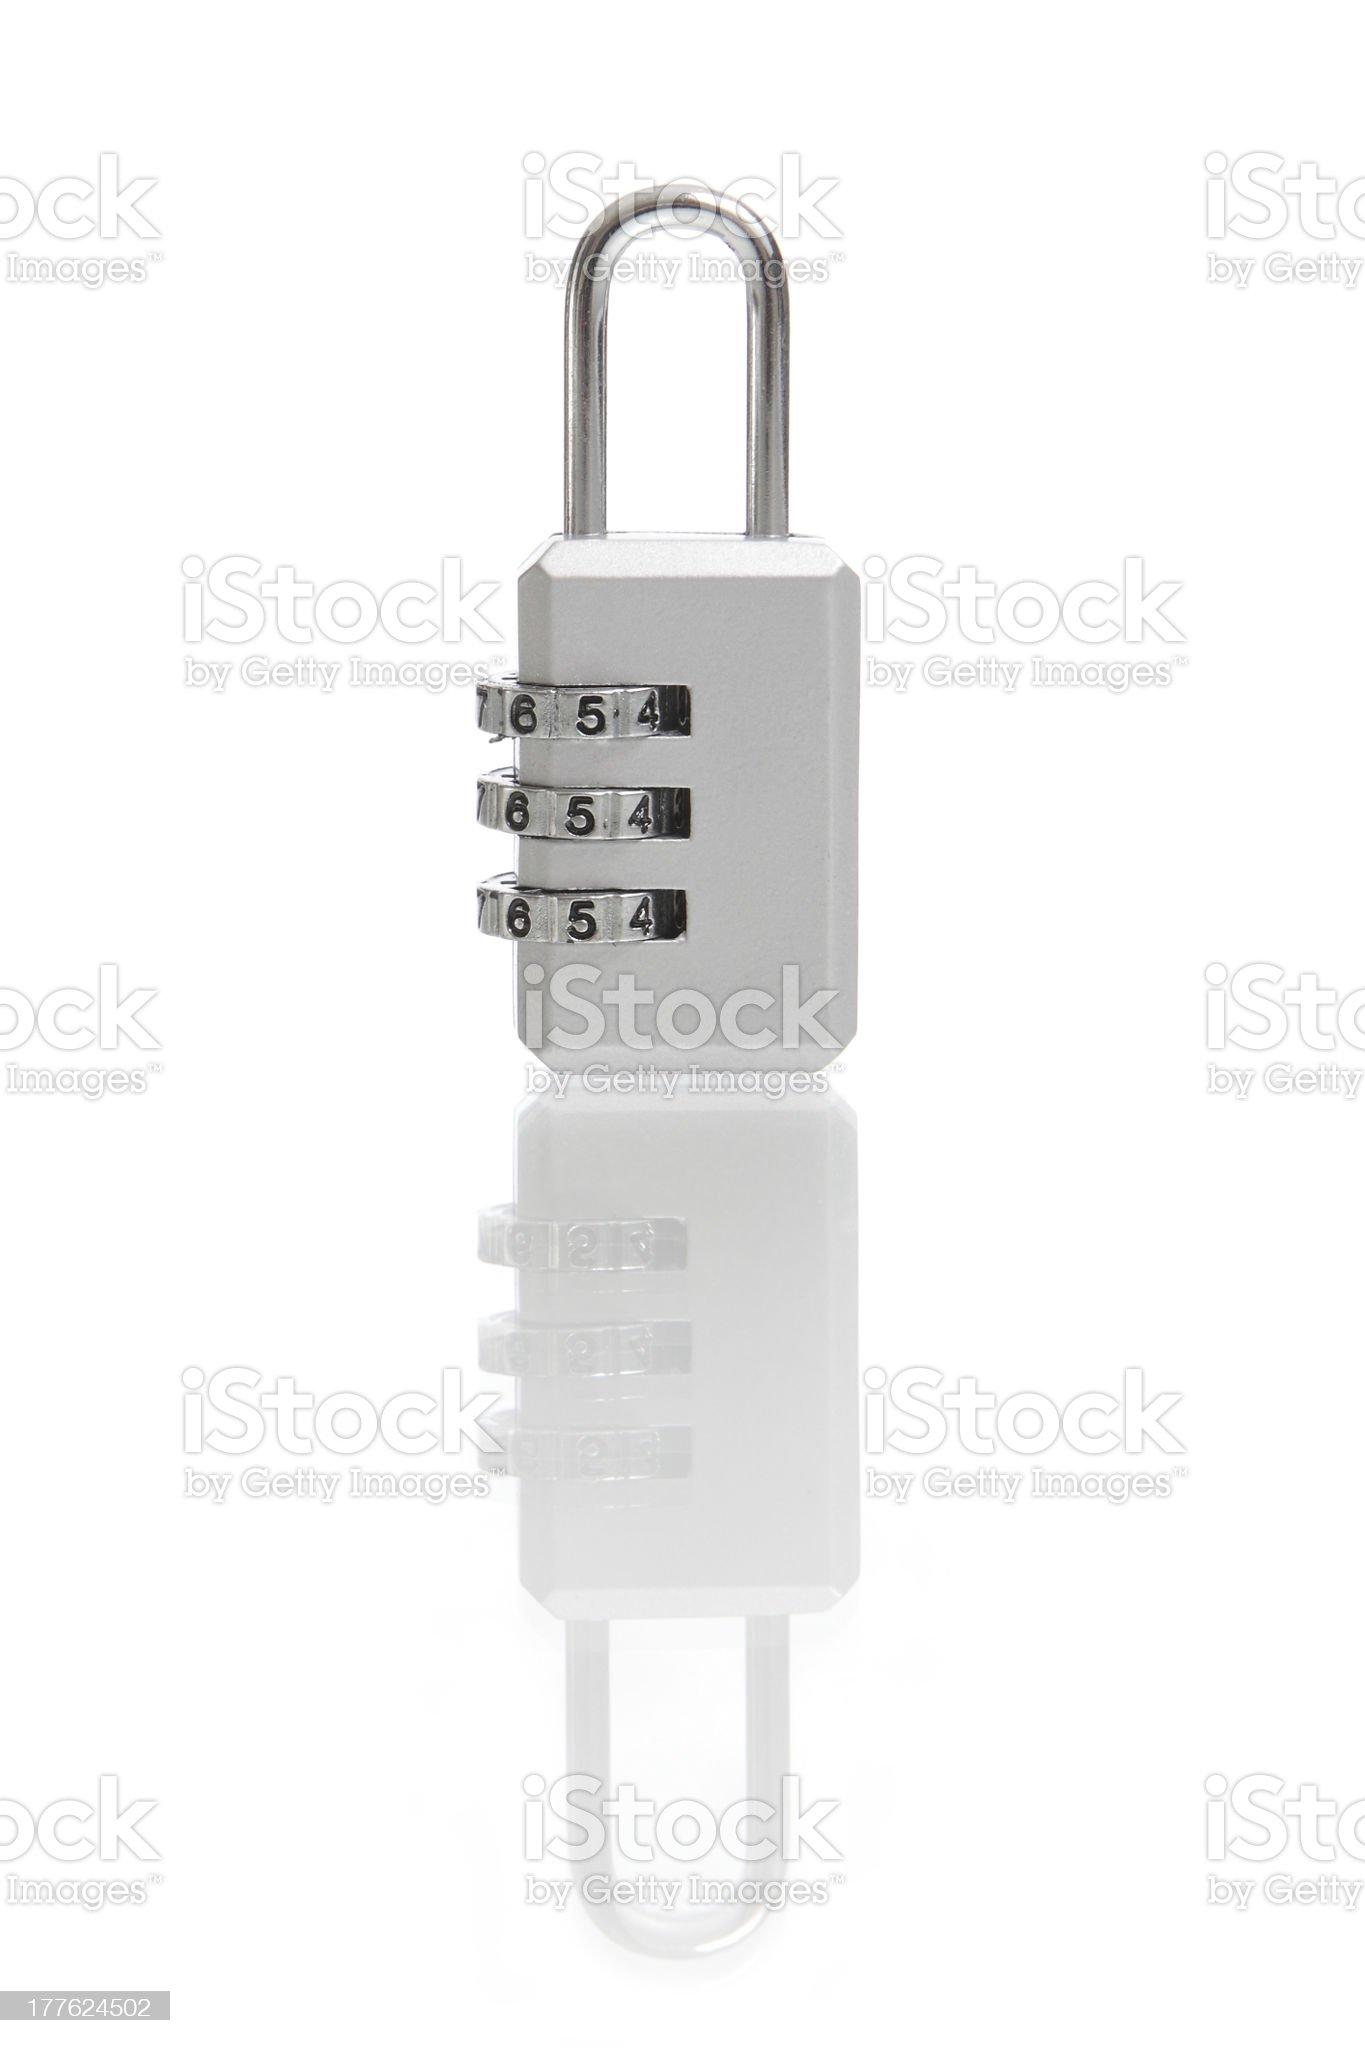 Digital combination lock royalty-free stock photo